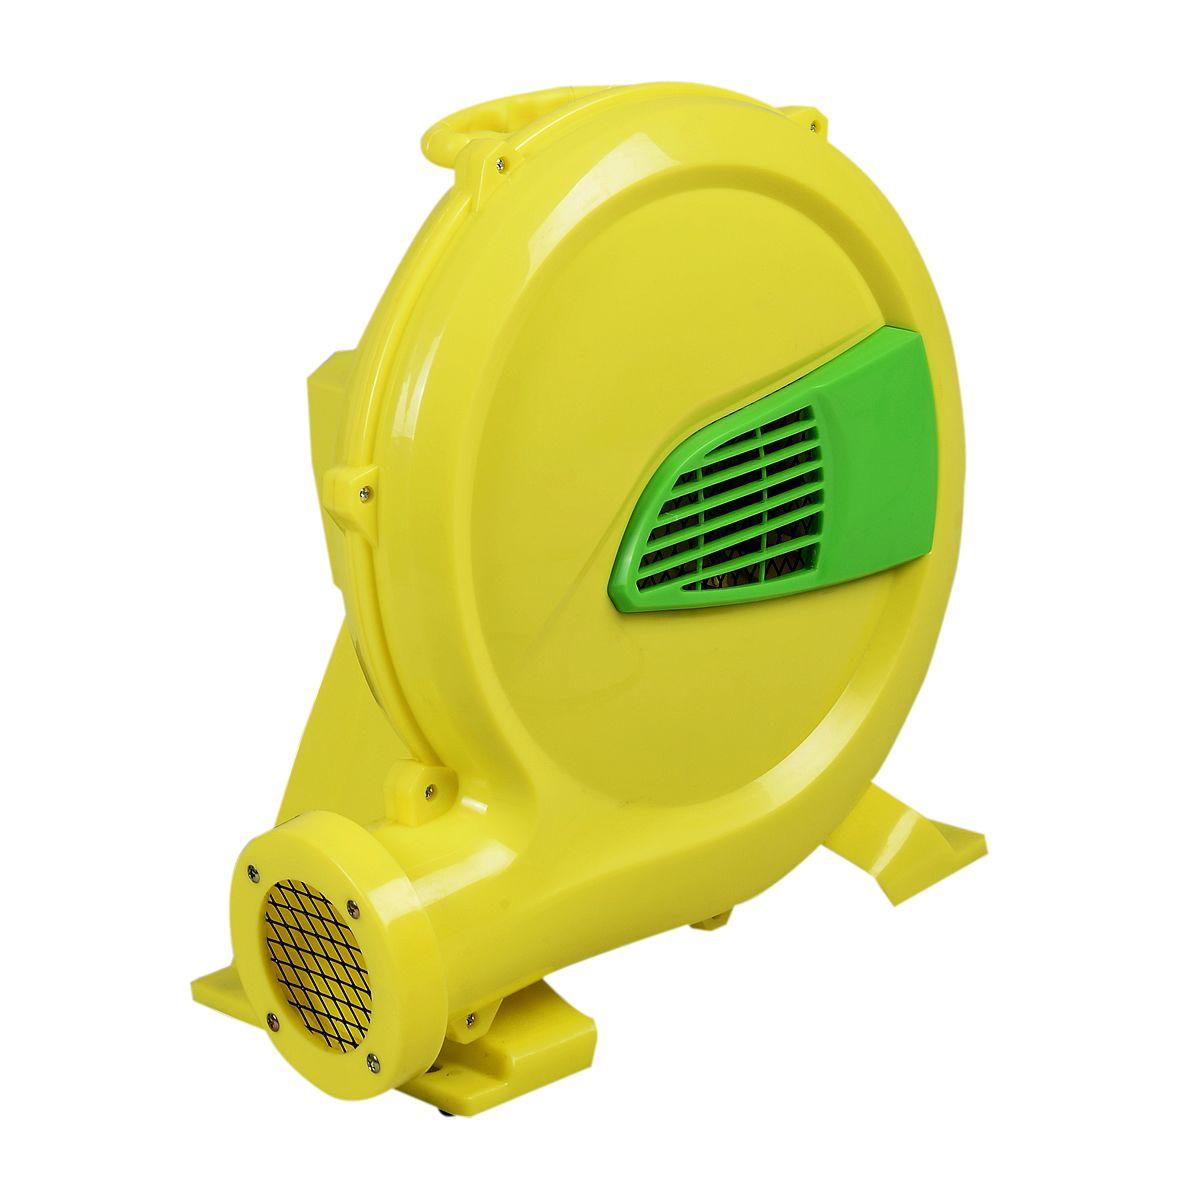 Air Blower Face : Air blower pump fan watt hp for inflatable bounce